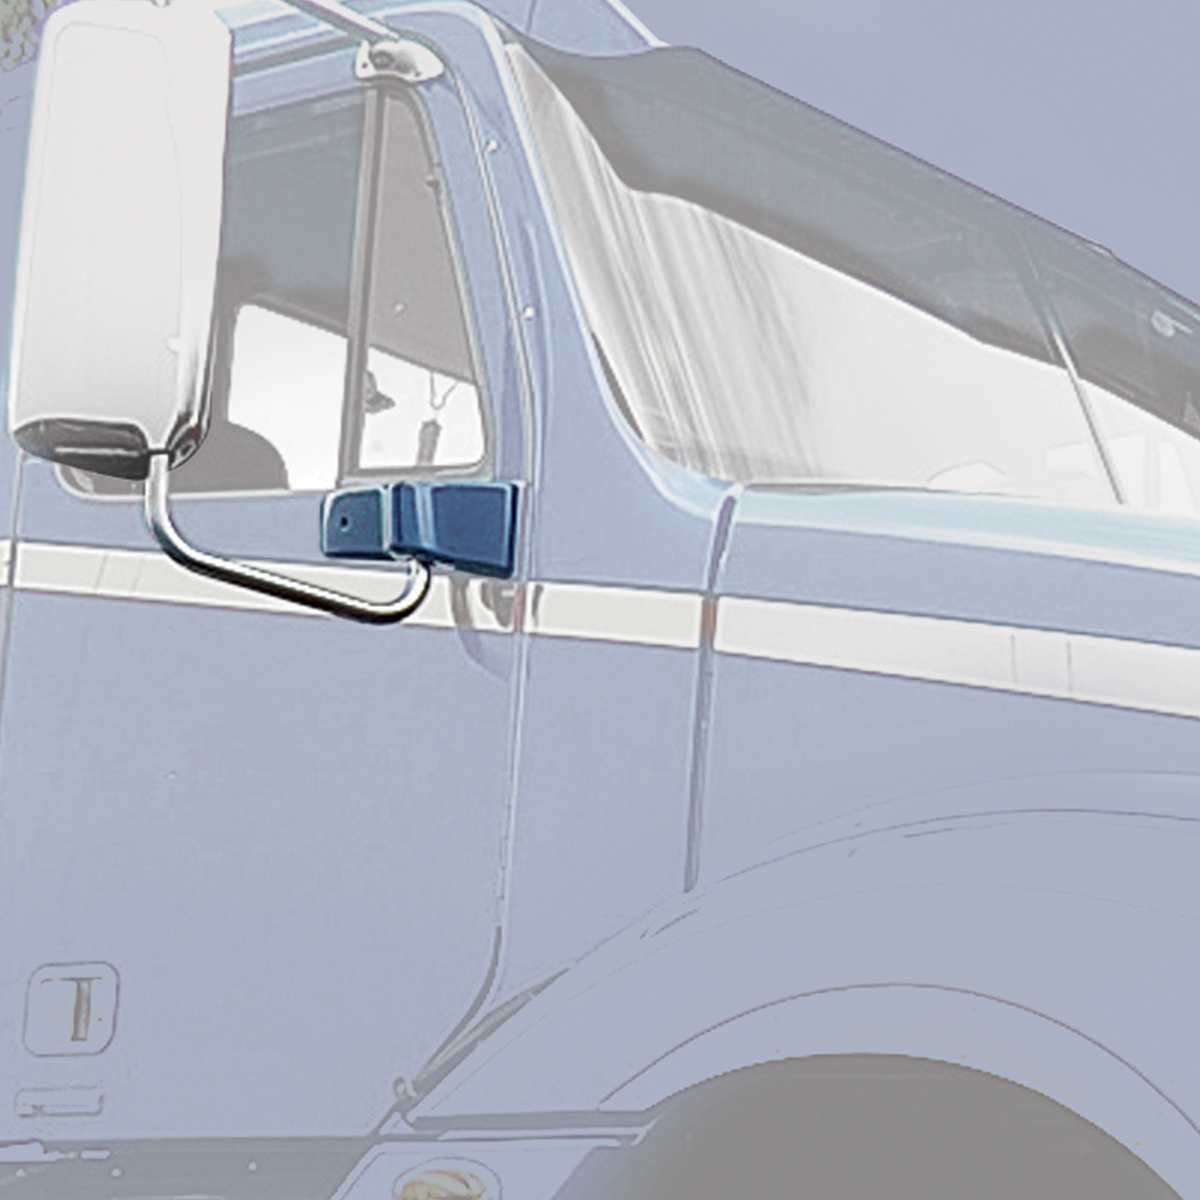 67813 Chrome Plastic Exterior Door Mirror Bracket Cover for Freightliner